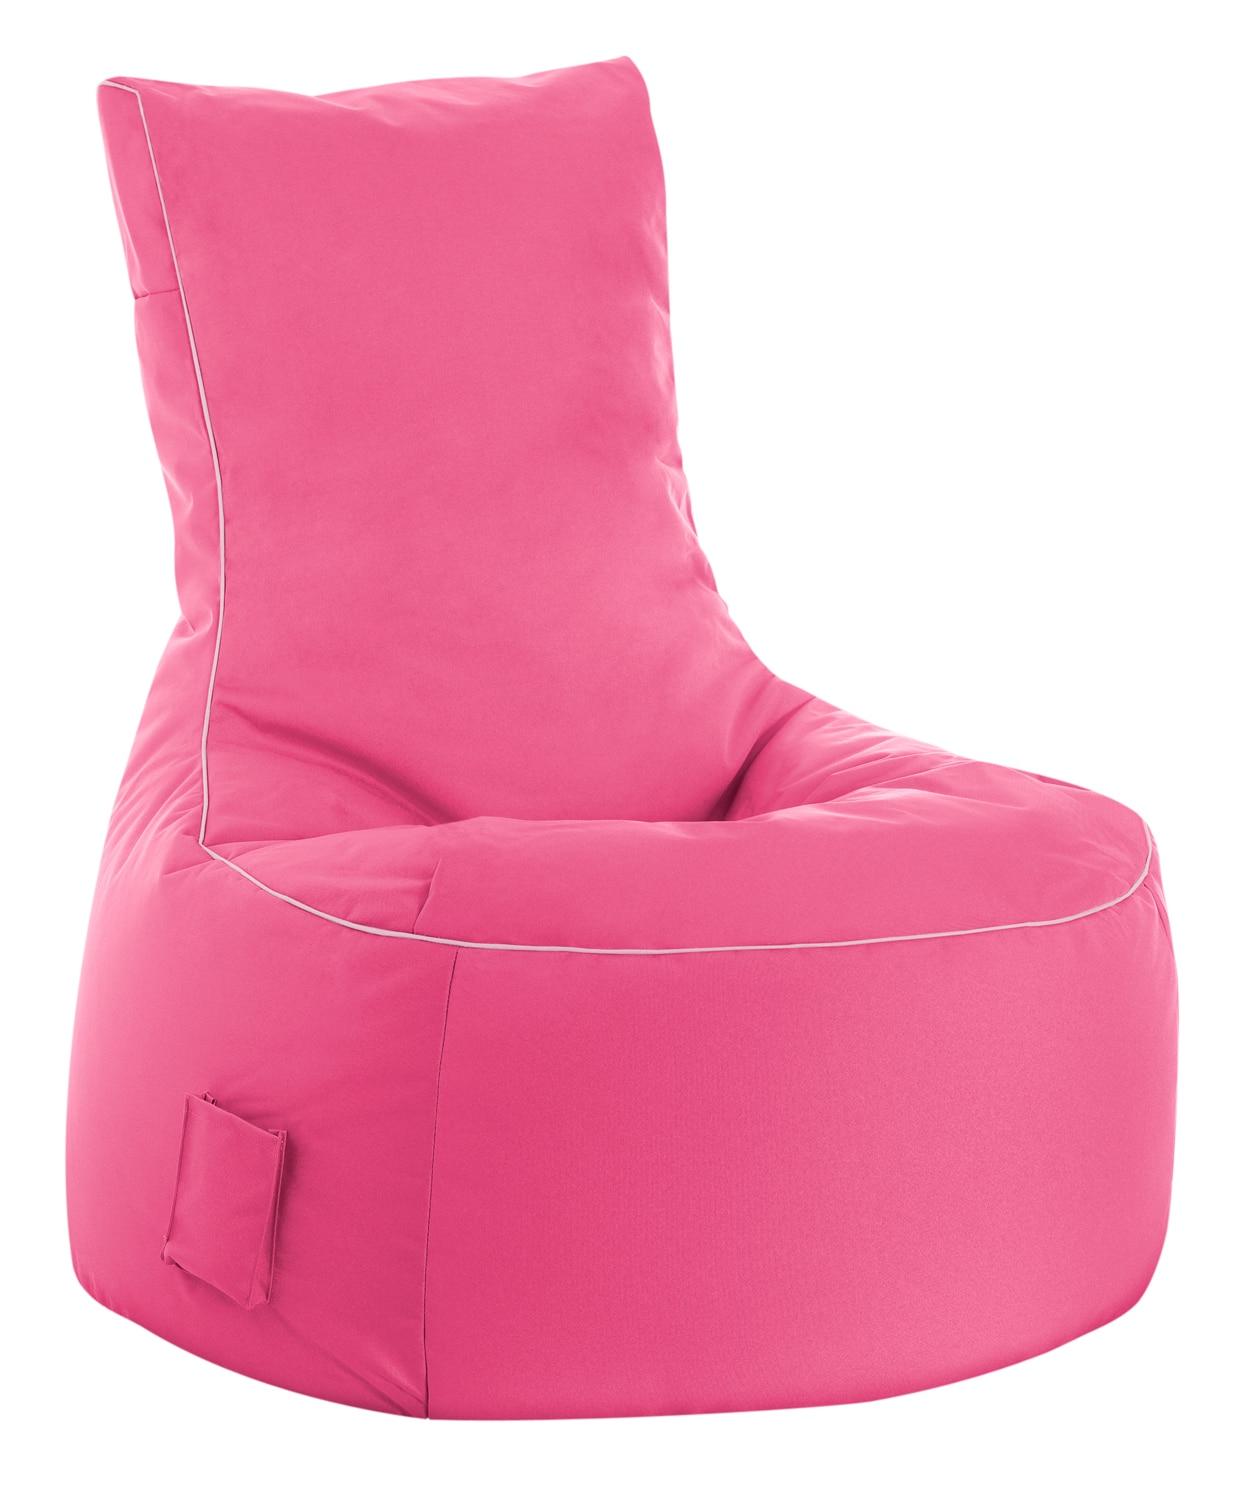 zitzak stoel buiten roze sitting bags. Black Bedroom Furniture Sets. Home Design Ideas